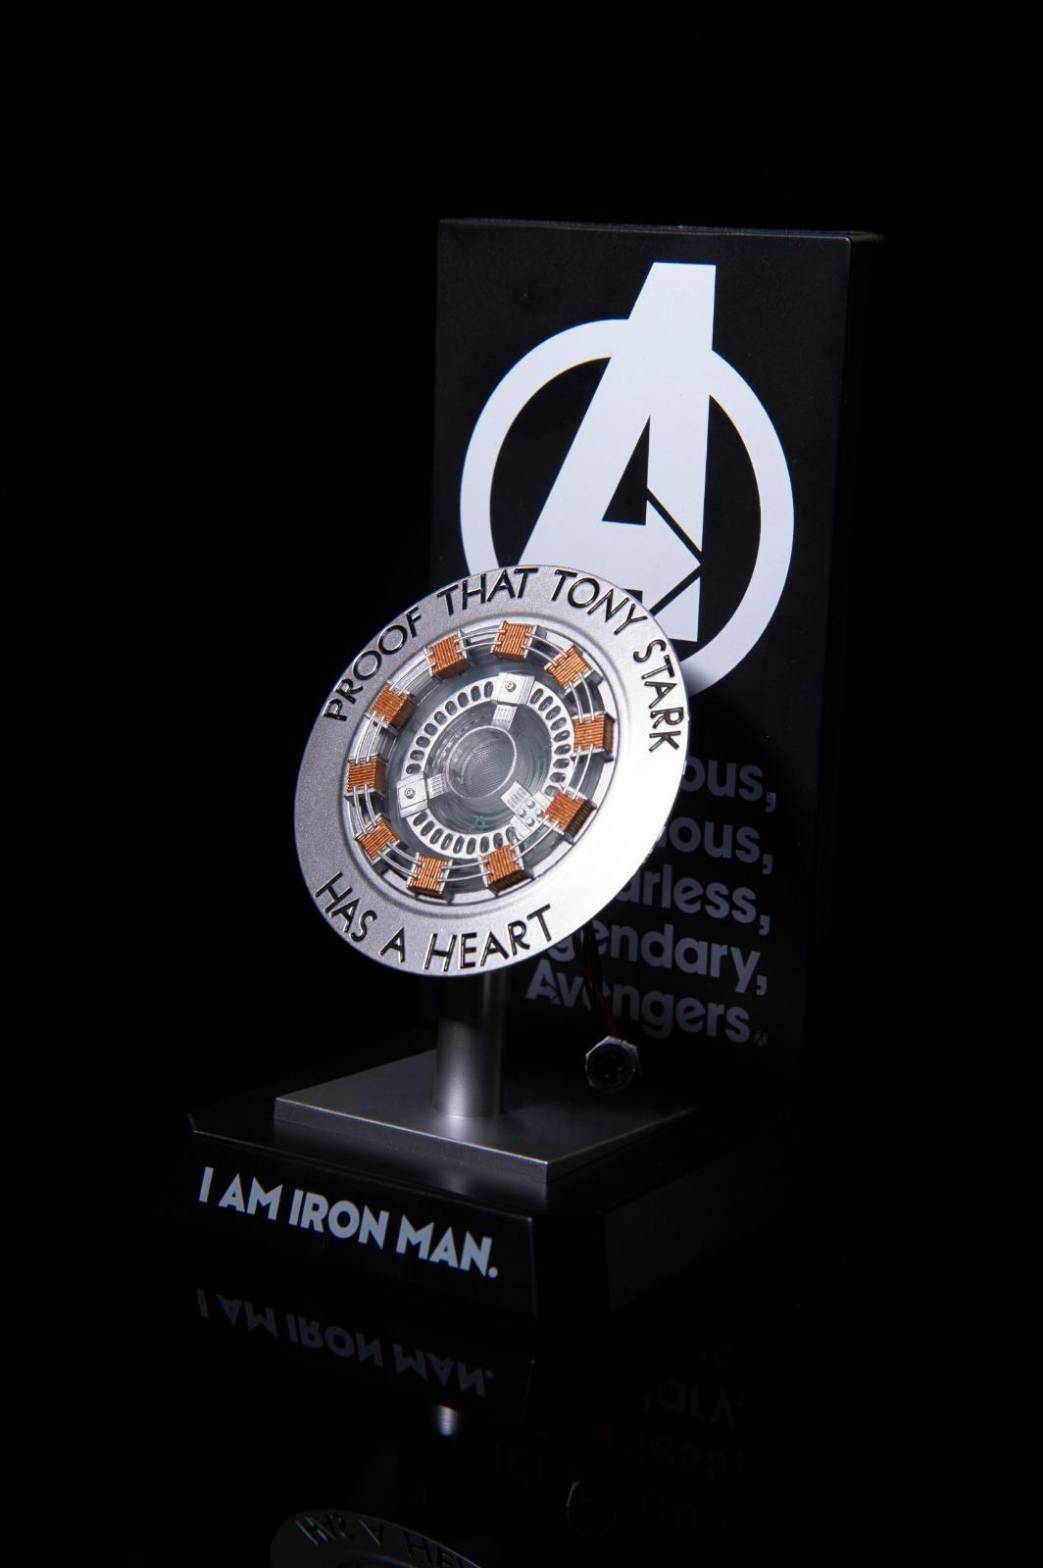 Marvel鋼鐵人反應爐 小夜燈無線充電座